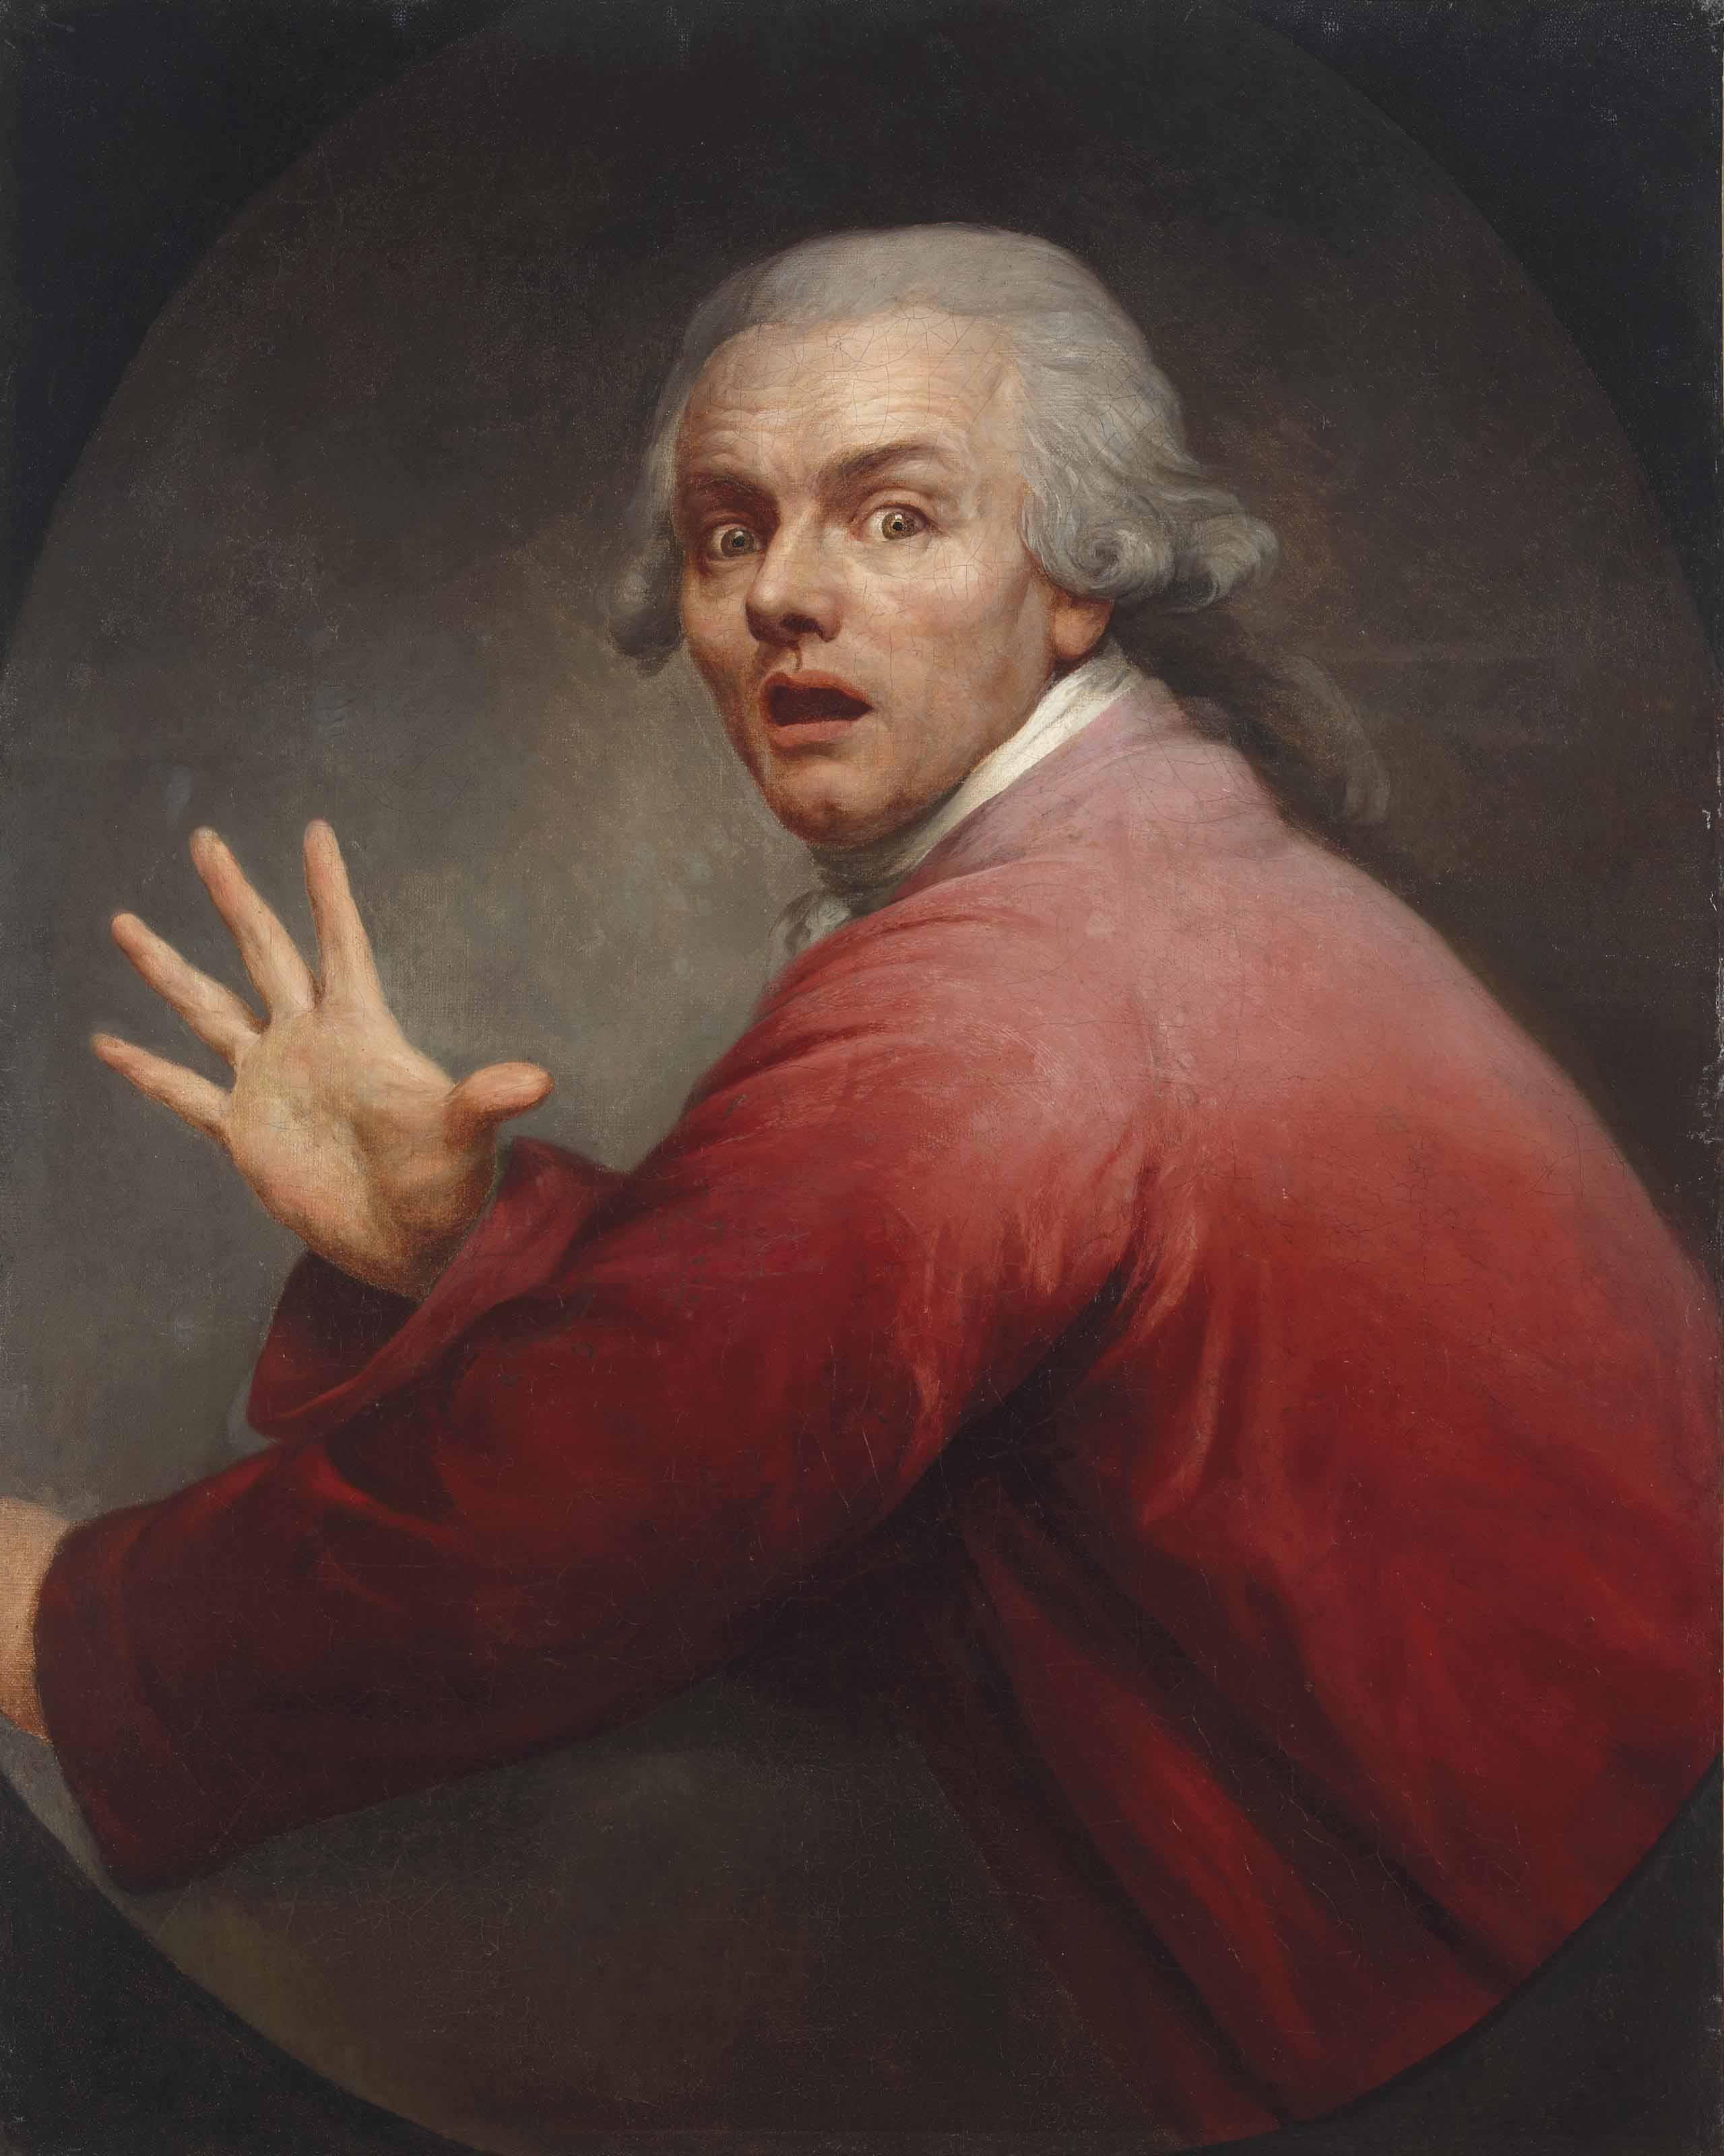 Joseph Decreux : joseph, decreux, File:2013, 03547, 000(joseph, Ducreux, Autoportrait, Homme, Surpris, Terrorise).jpg, Wikimedia, Commons